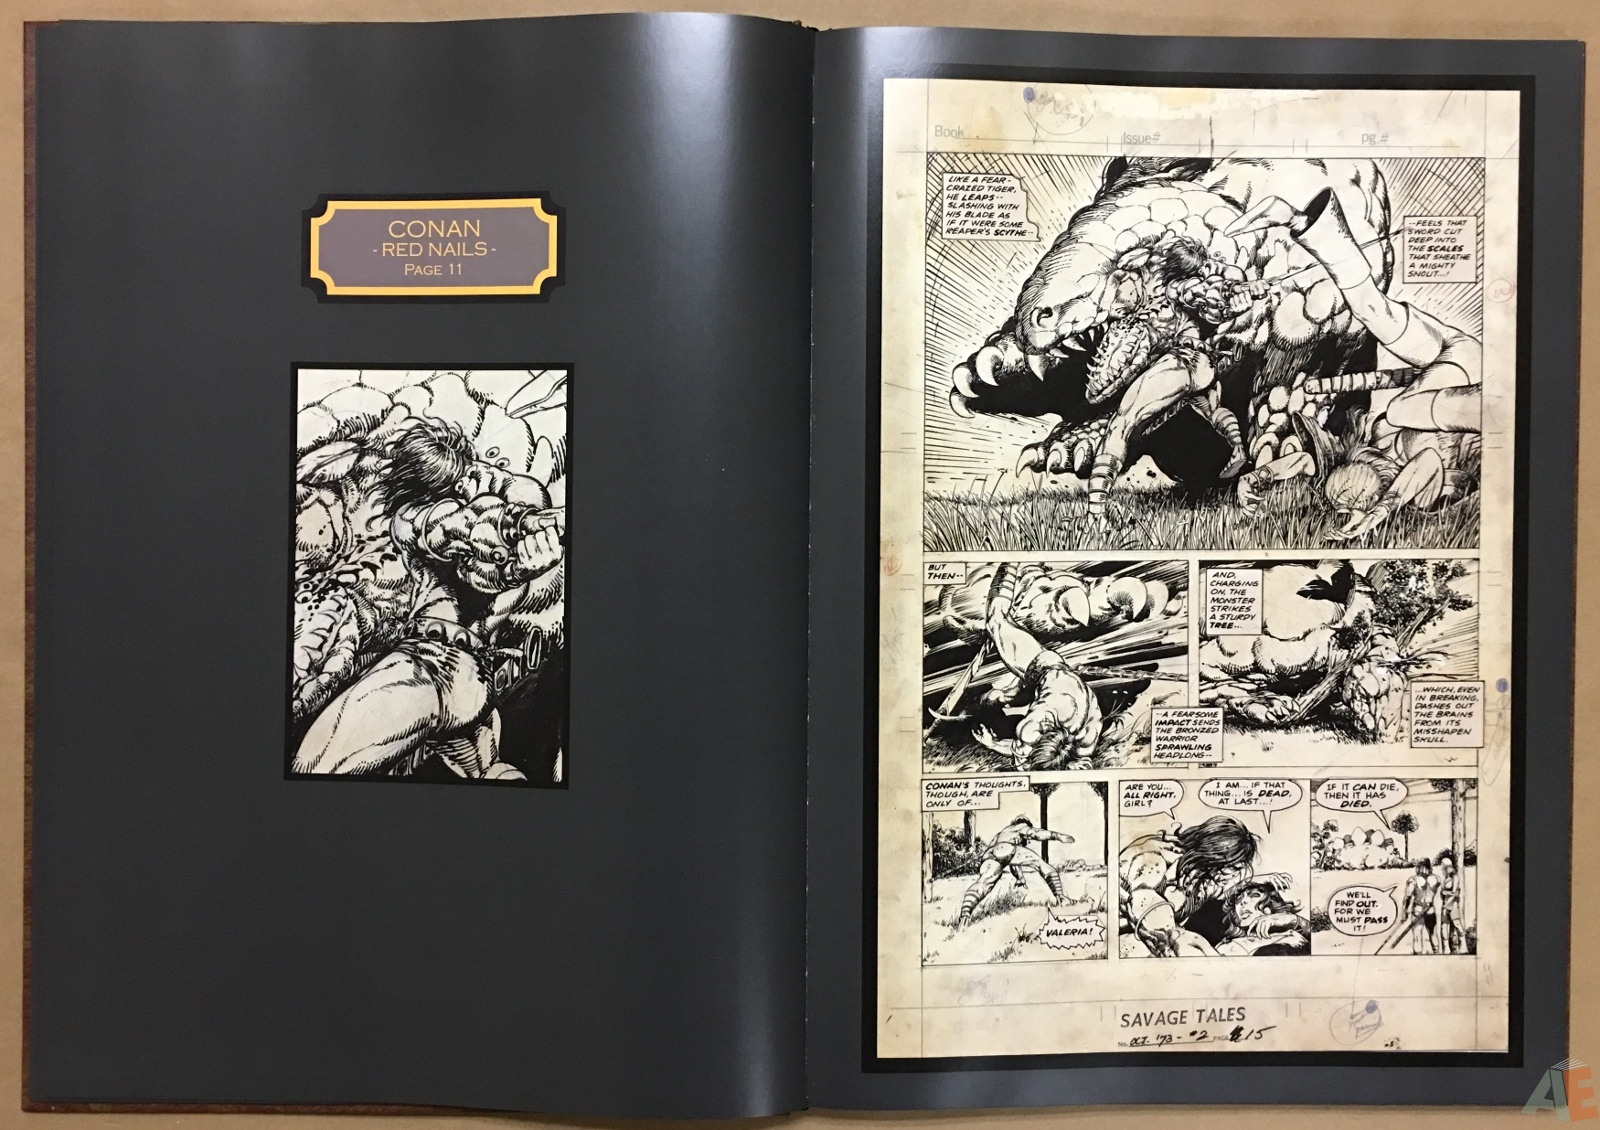 Conan: Red Nails Original Art Archives Volume 1 14